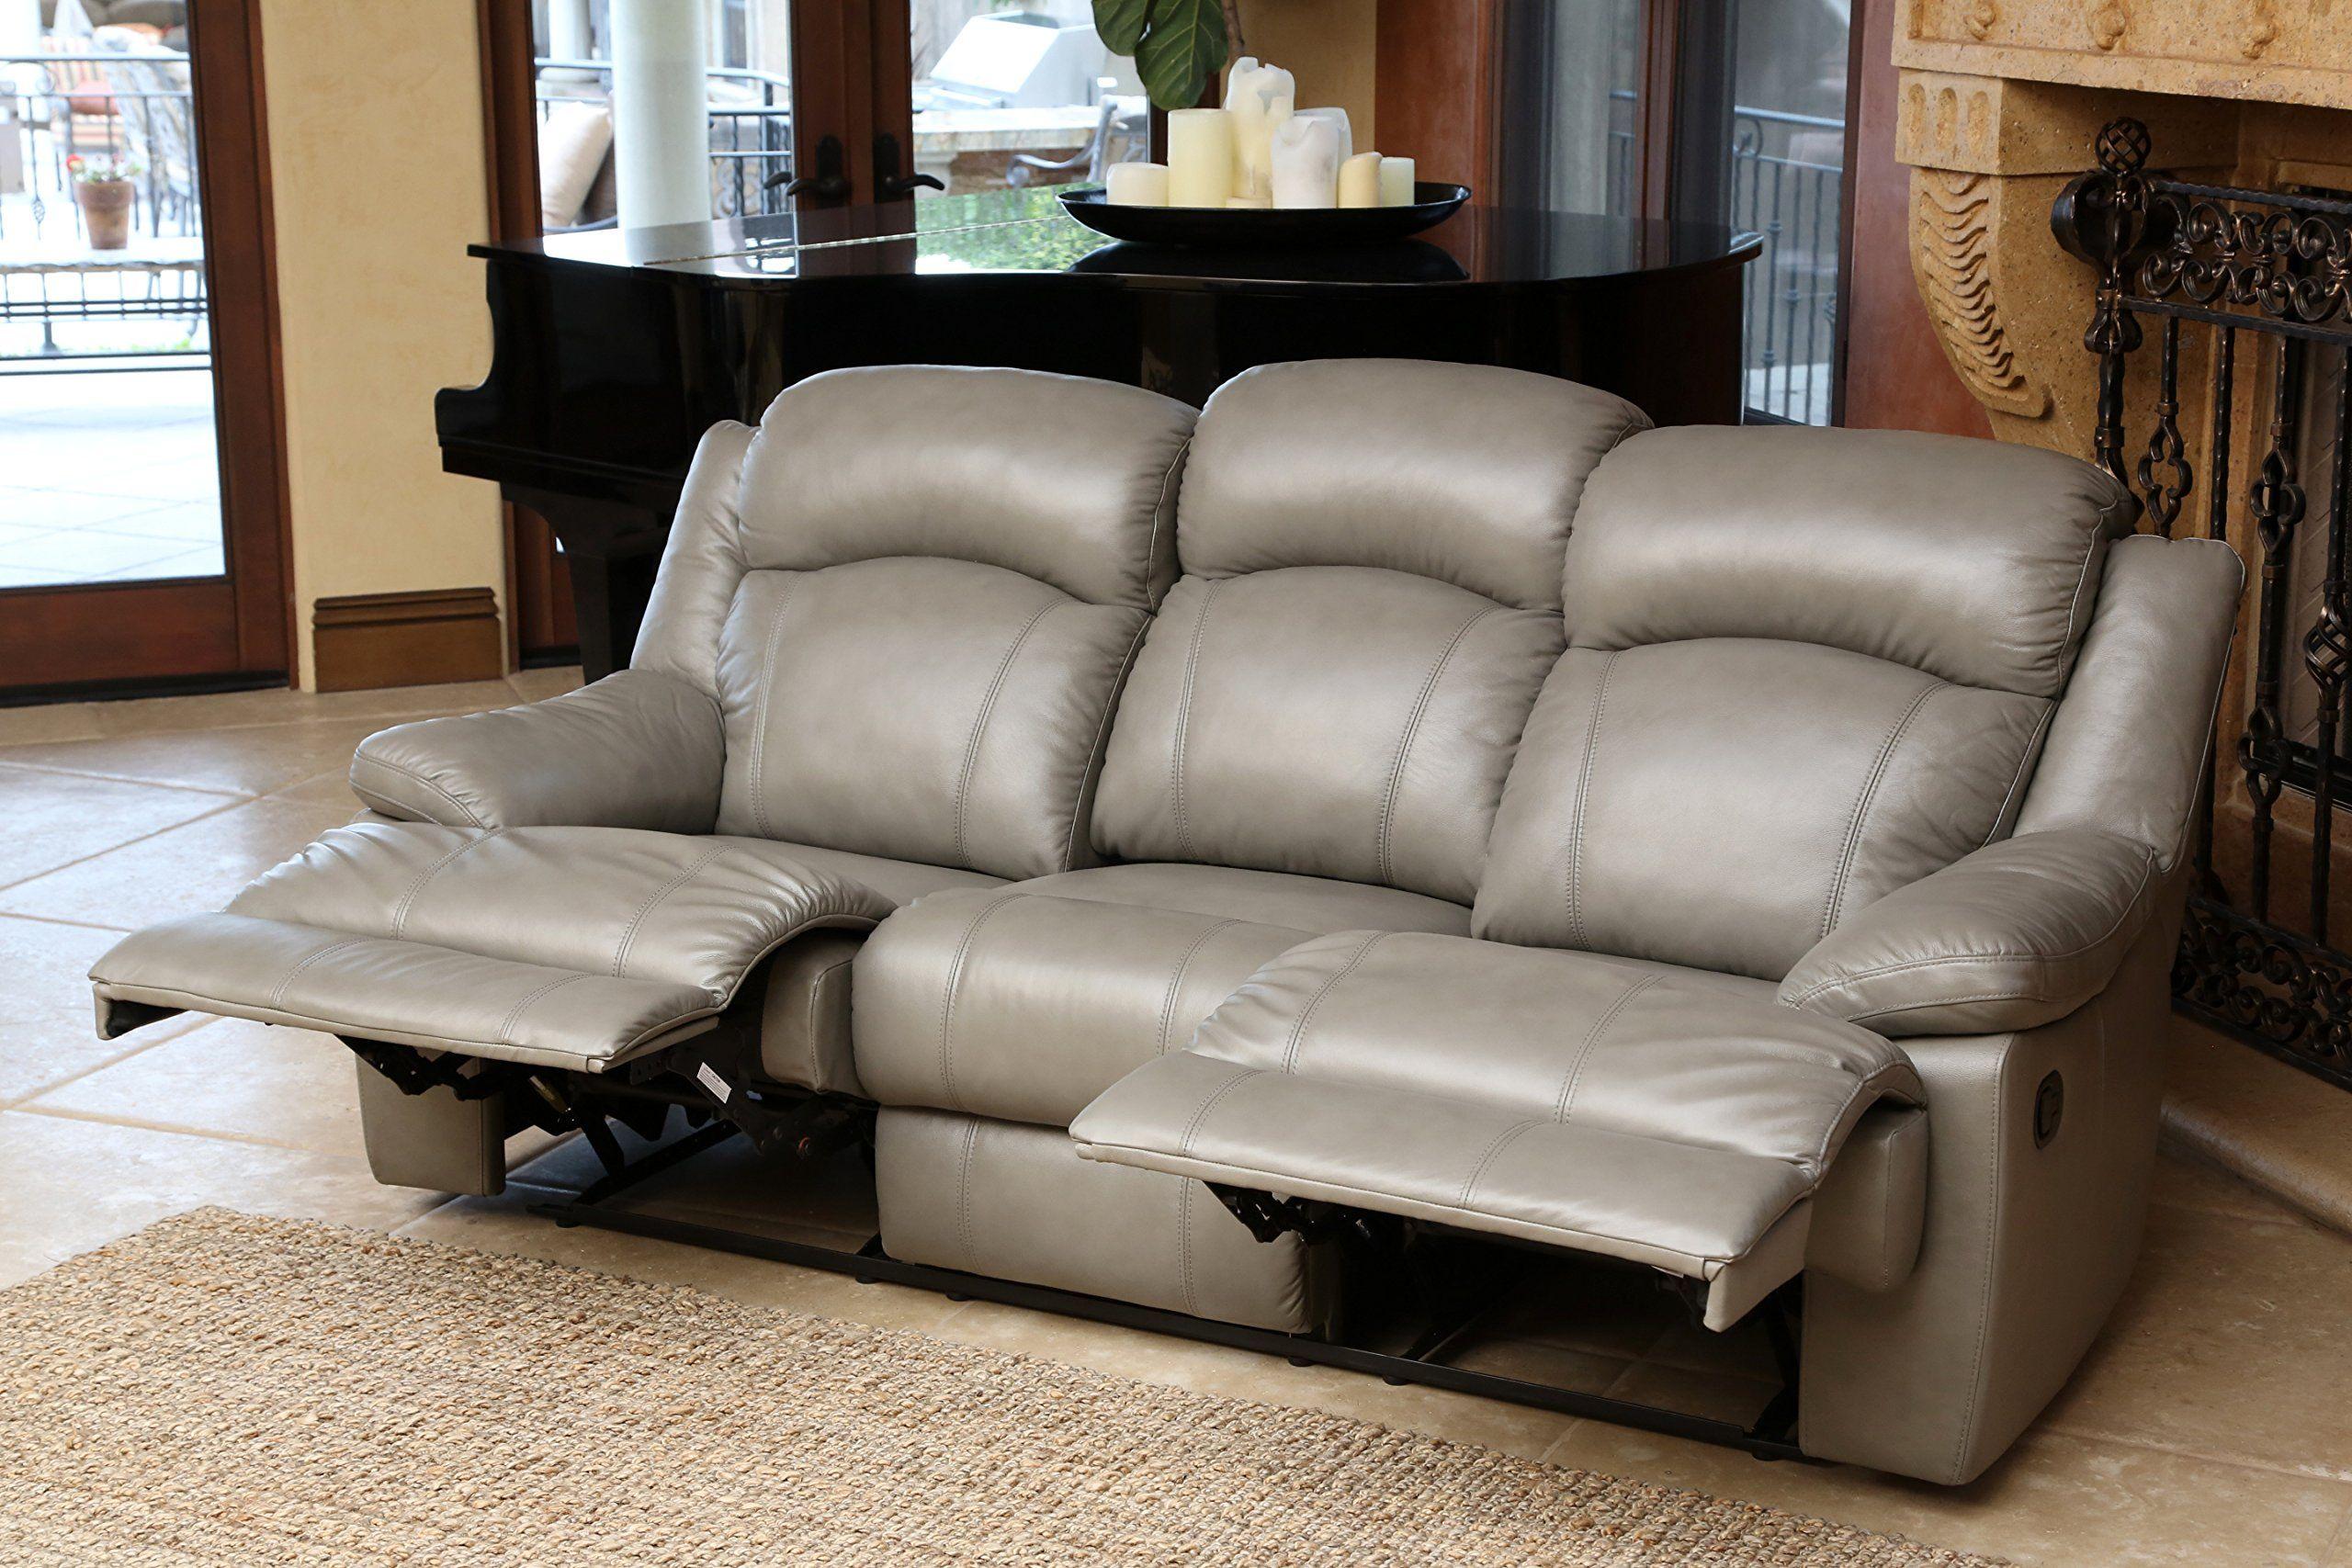 Abbysona 3piece Maverick Top Grain Leather Reclining Sofa